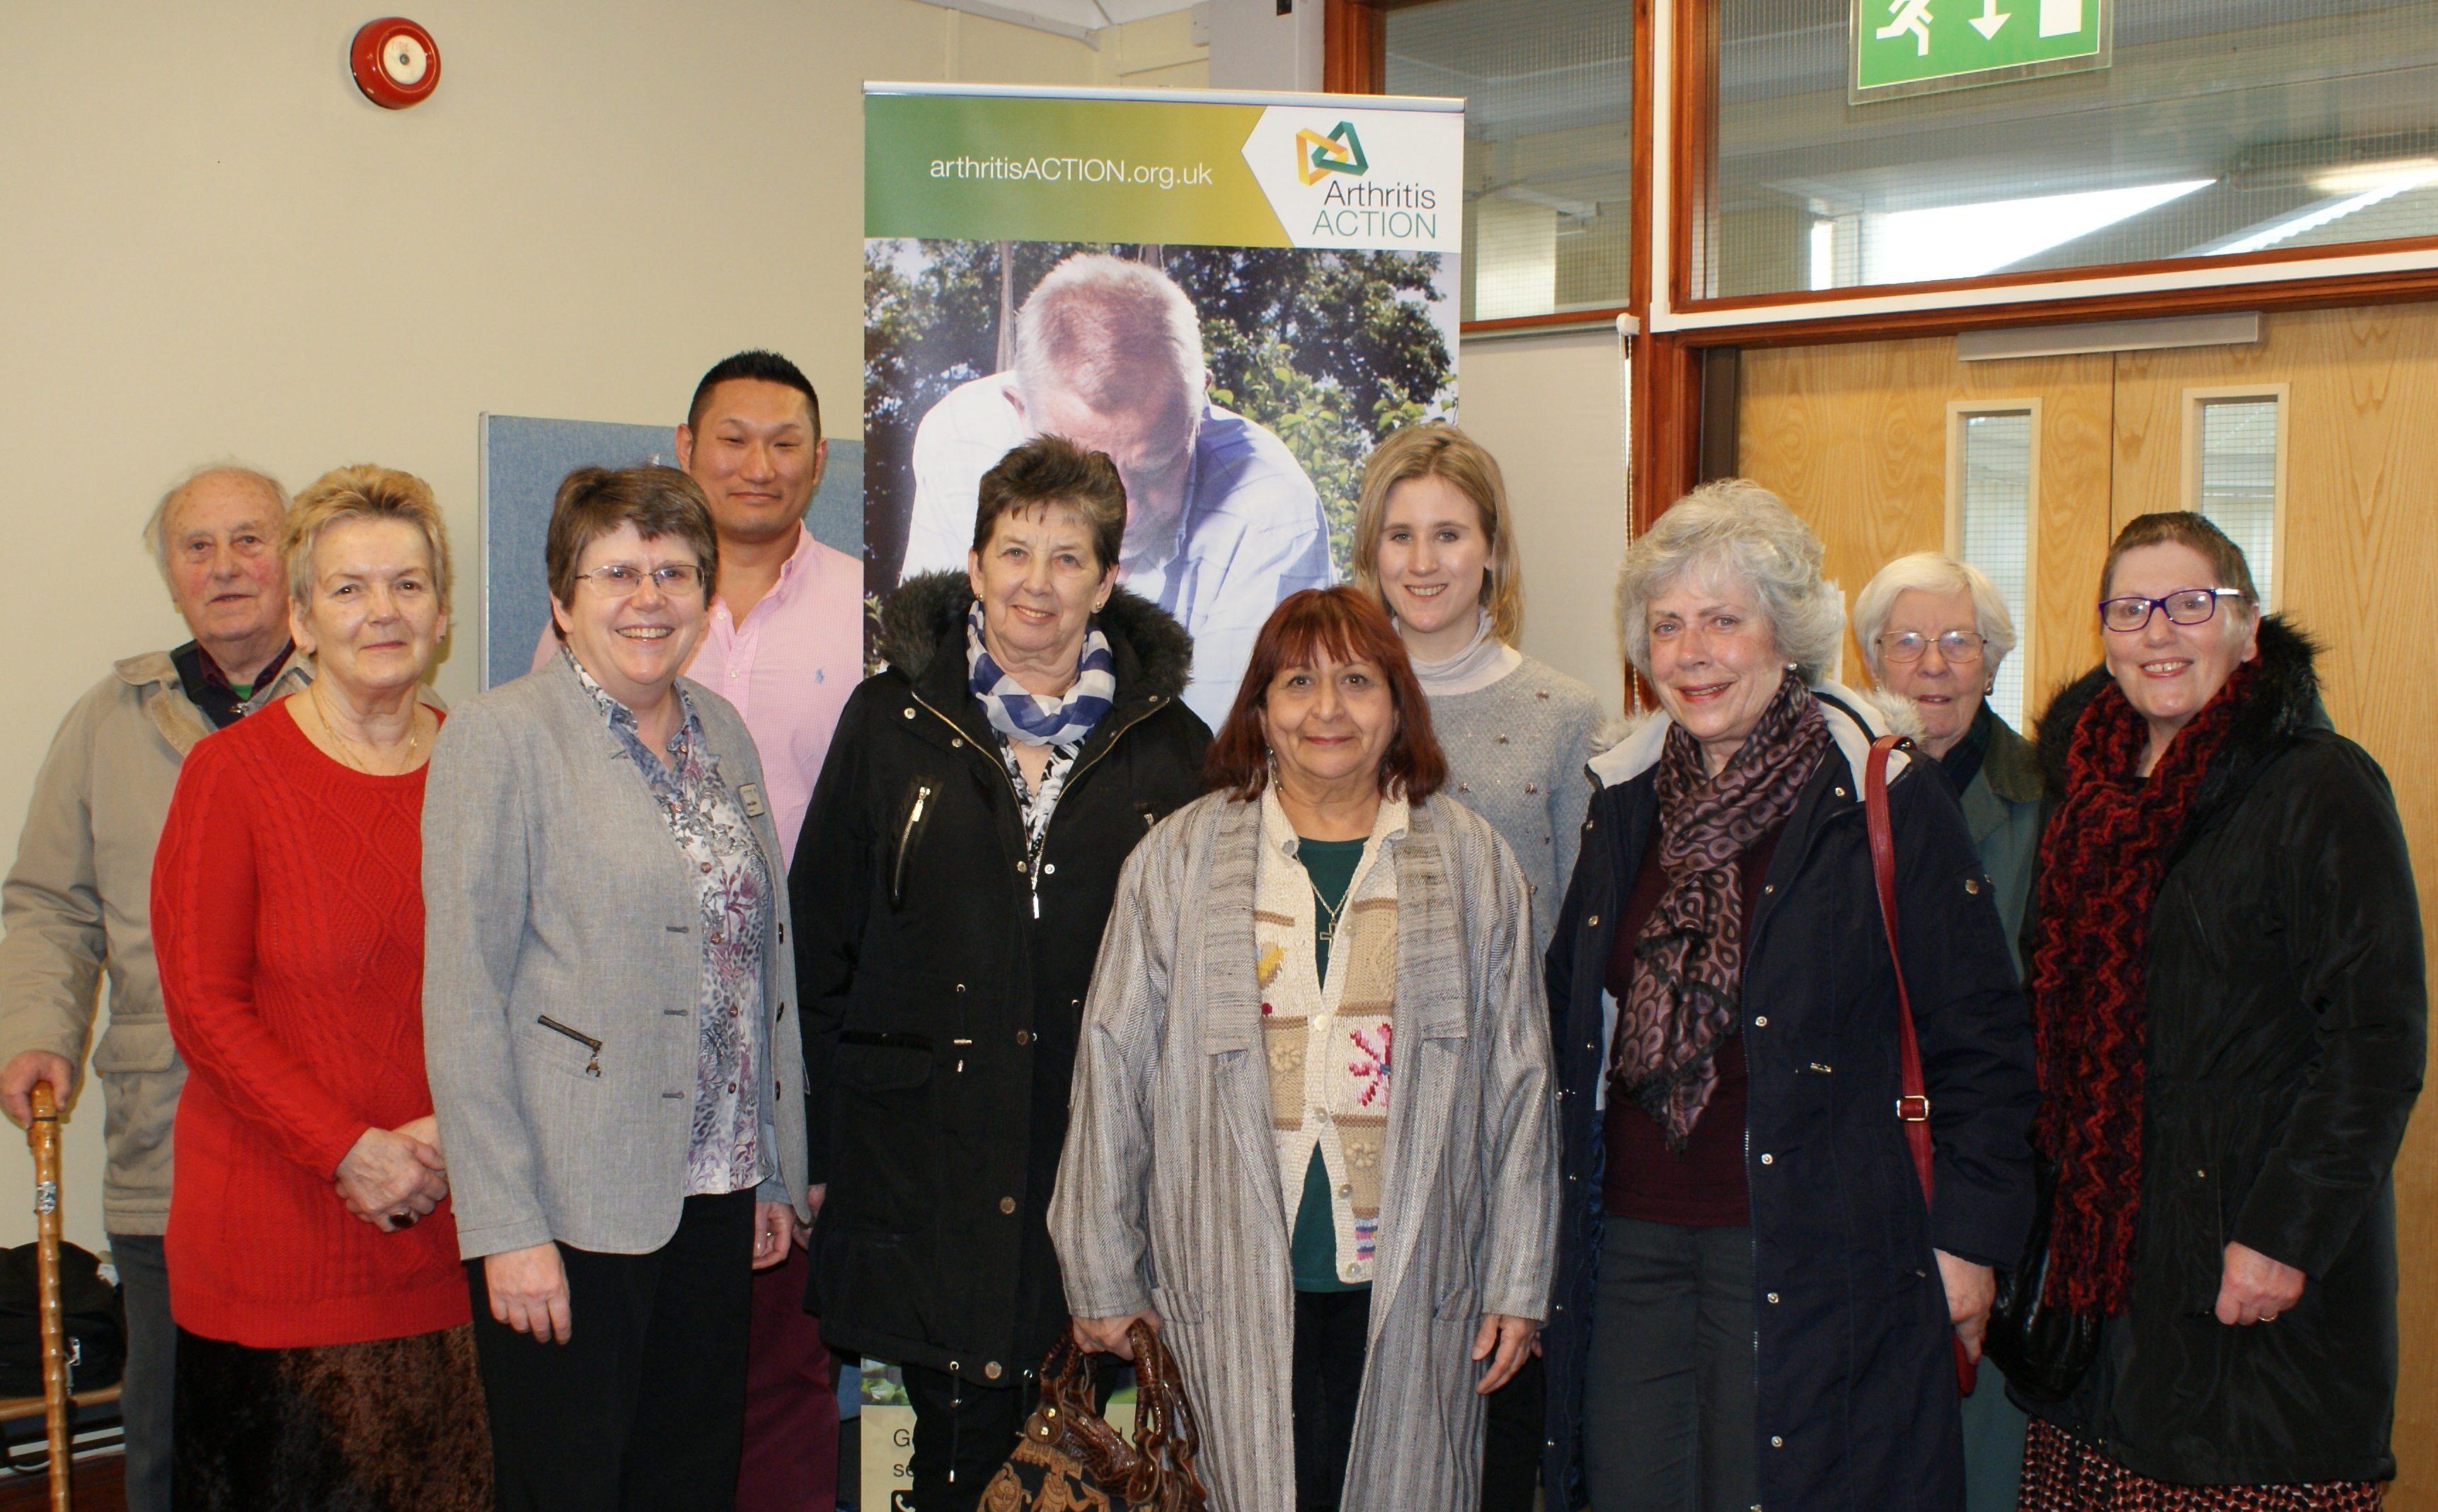 Arthritis Action Group welcomes Patient Director